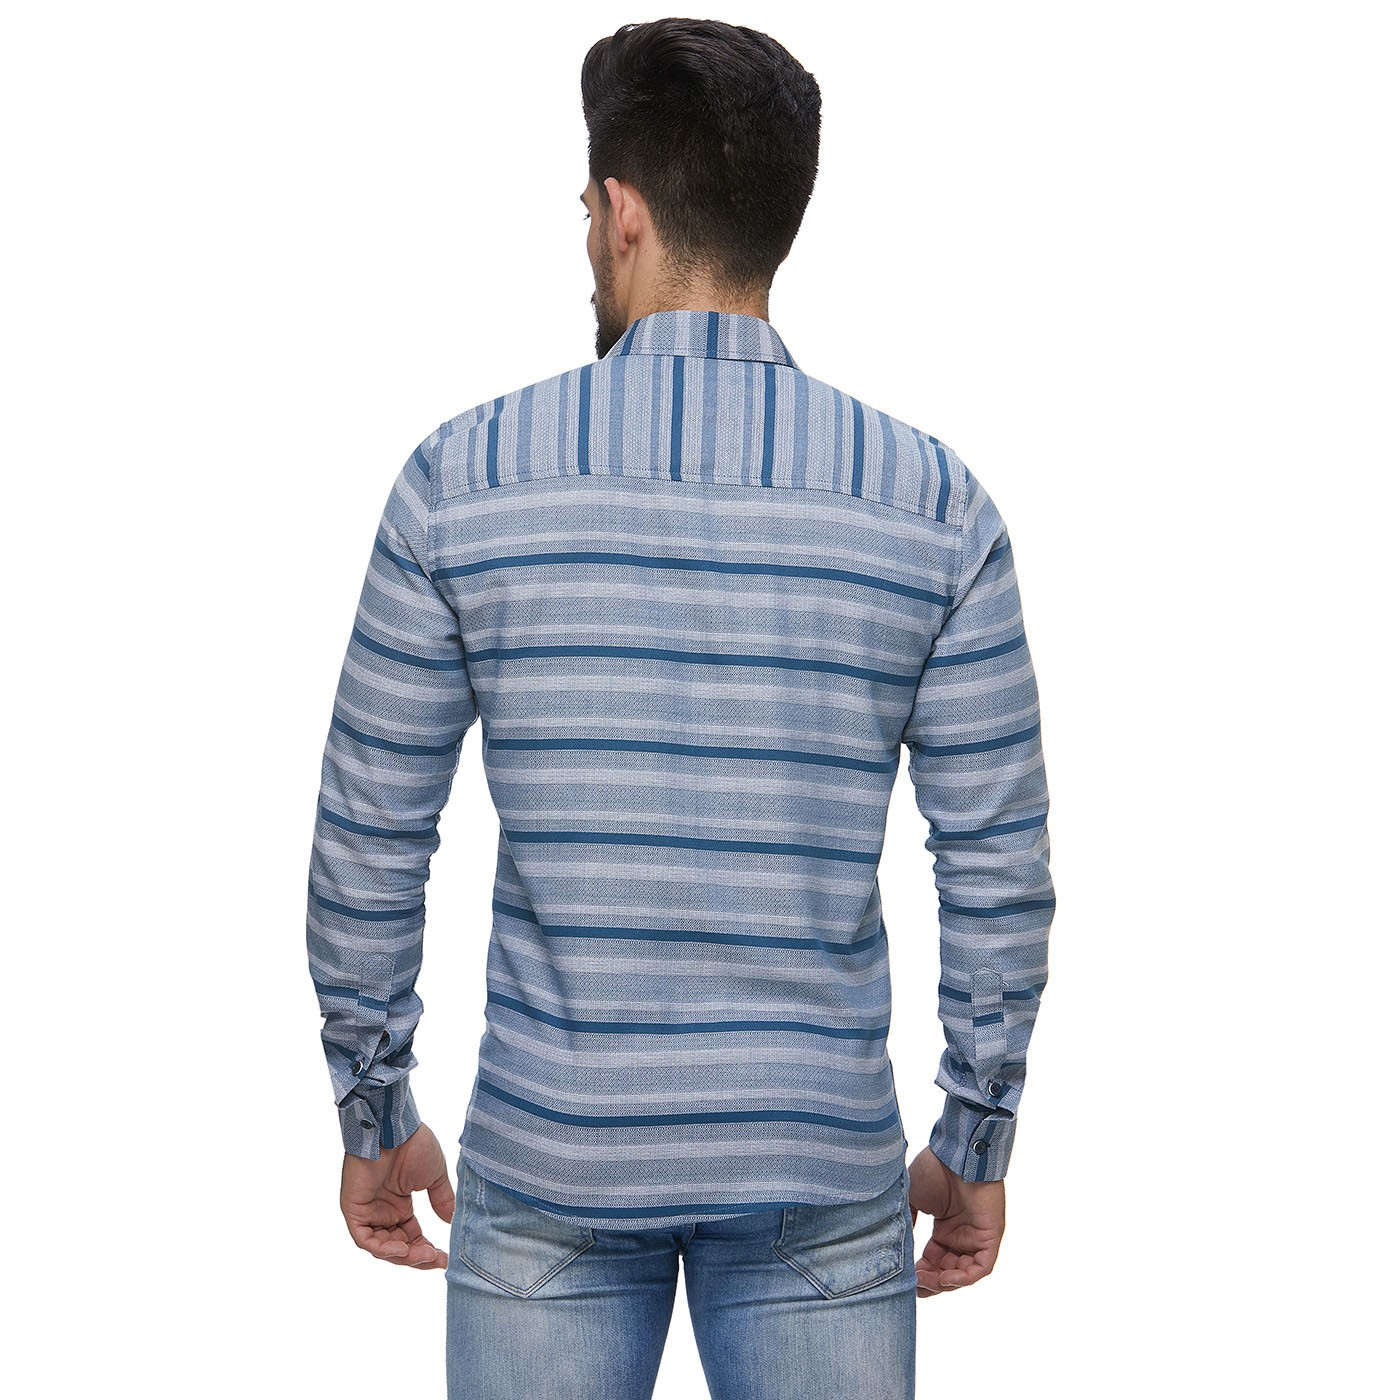 Camisa Zaiko Masculino Black Friday Listrada Cinza/Azul Manga Longa Única (0989unica)